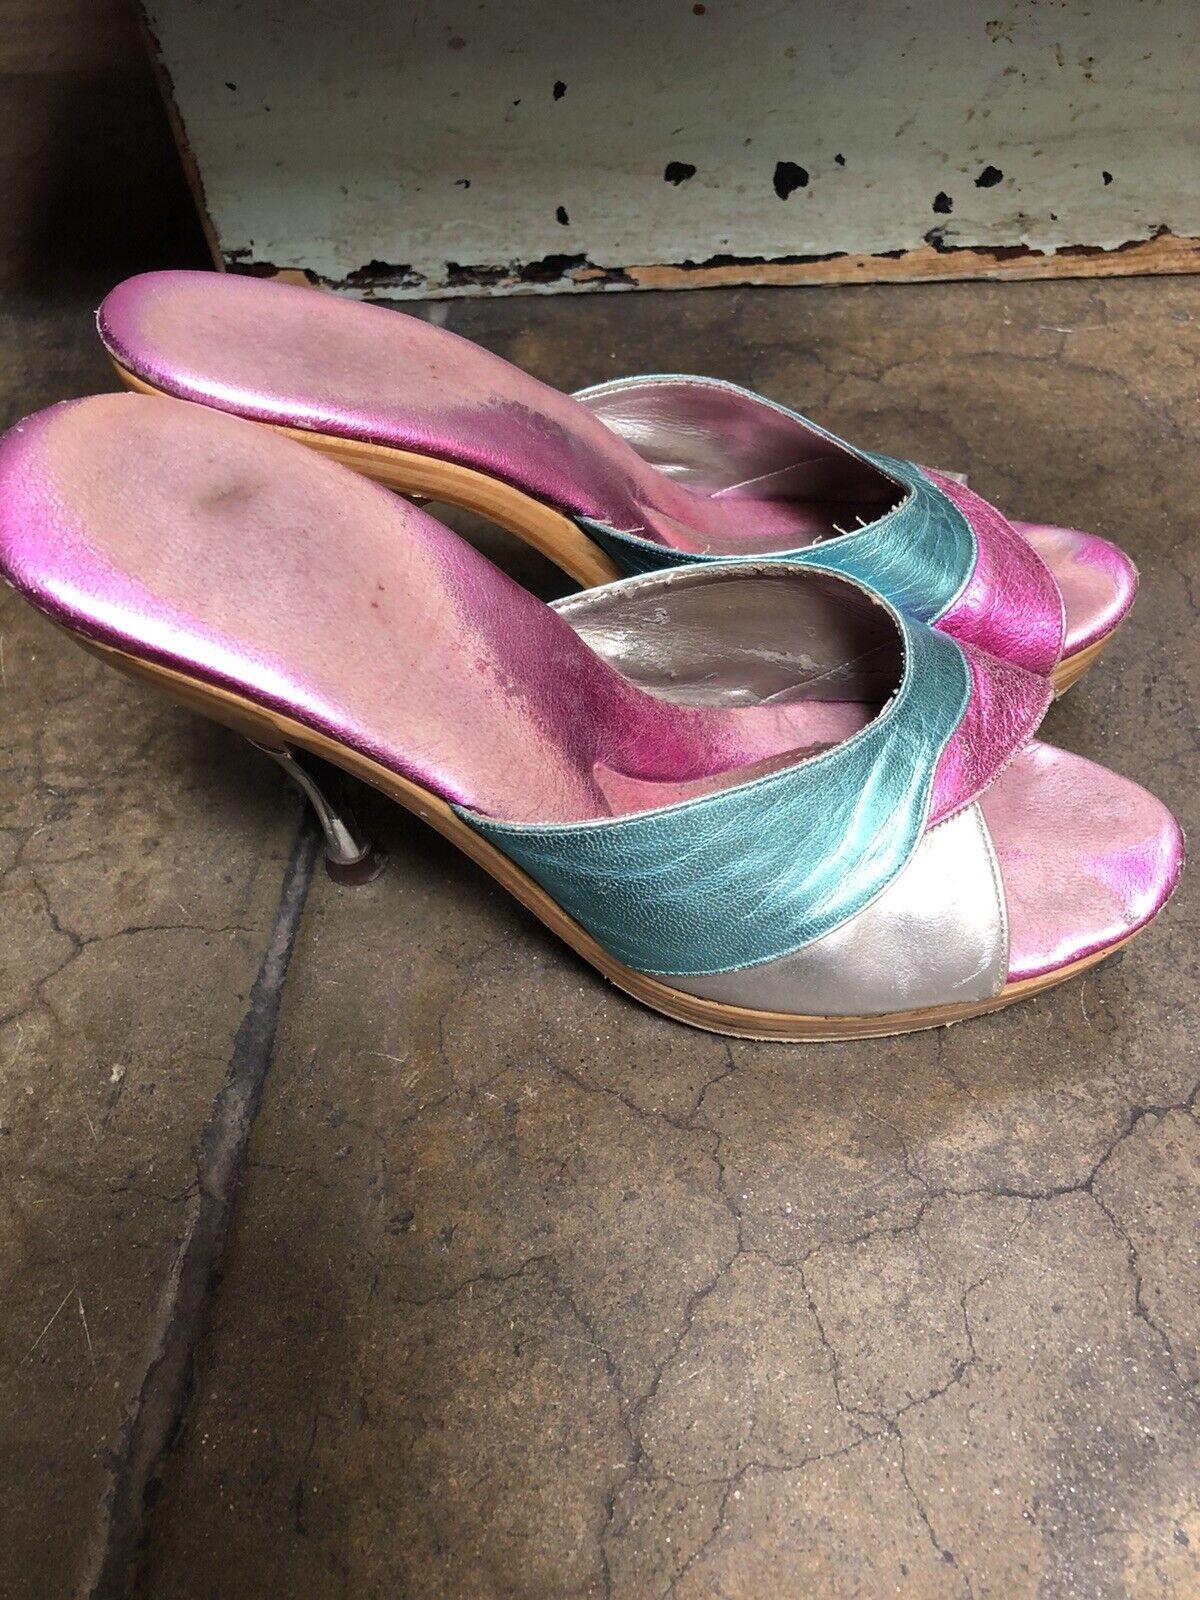 re-mix sandal - image 3